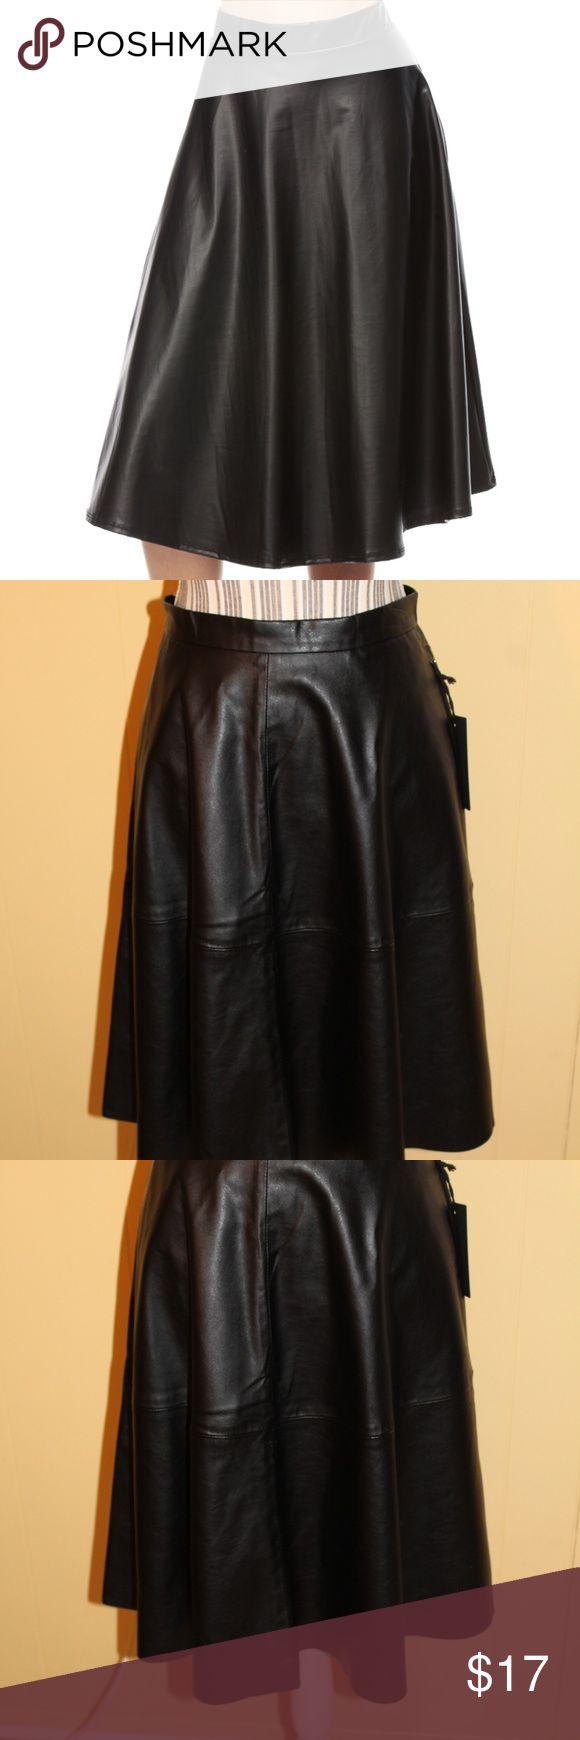 "NWT Forever 21 Faux Leather Skater Skirt Beautifully Draped Vegan Leather (Pleather) Skirt.  **NOT Identical to Stock Photo**  Shell: 100% Polyurethane Backing  Backing: 100% Polyester  28"" Waist 24"" Length Forever 21 Skirts Circle & Skater"